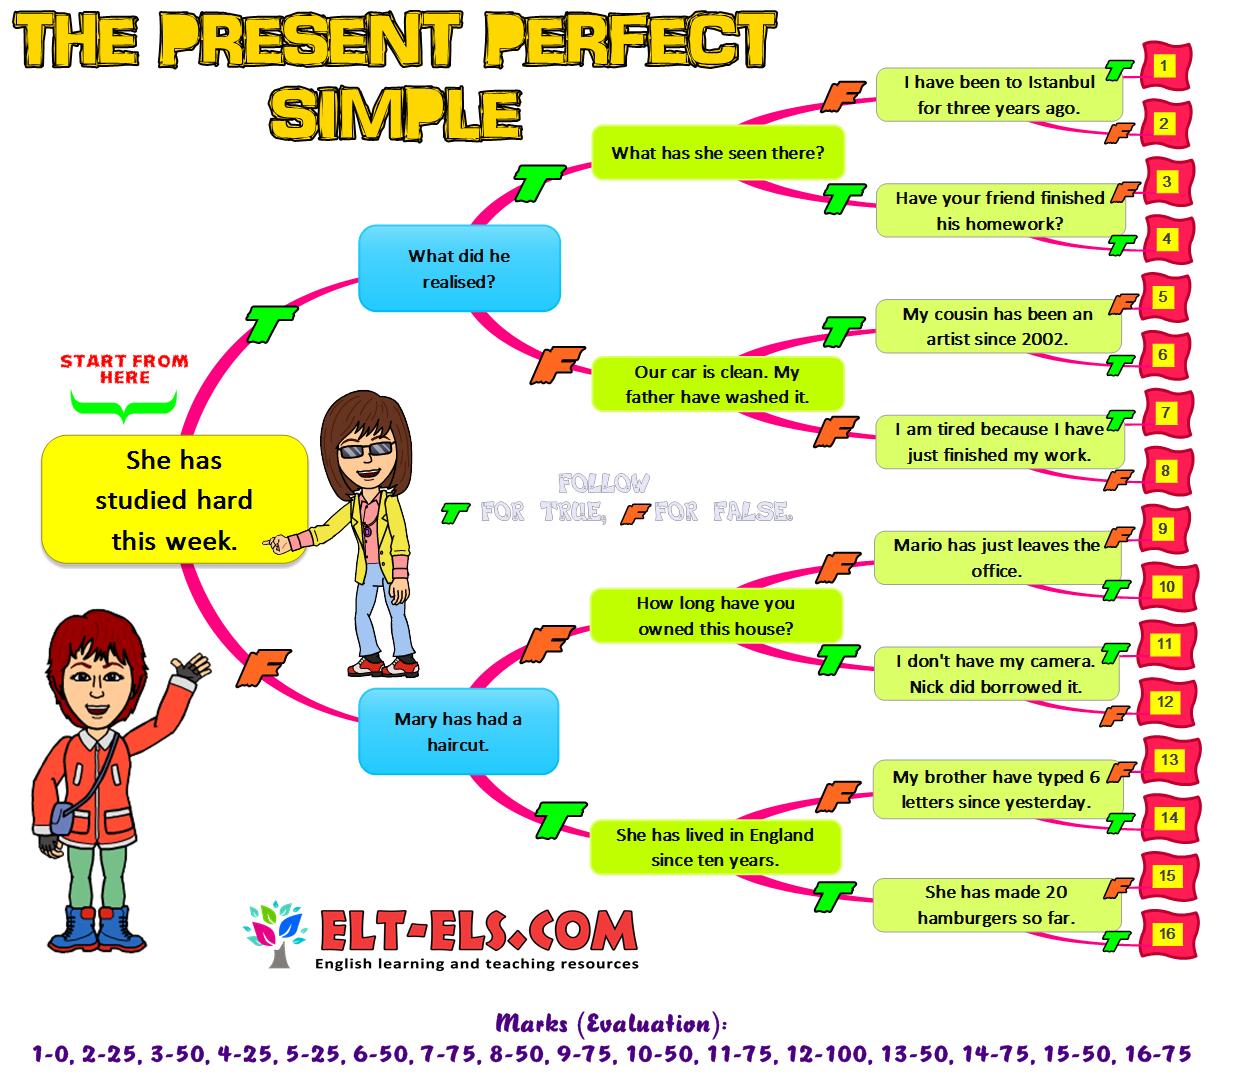 The Present Perfect Tense Diagnostic Tree Quiz